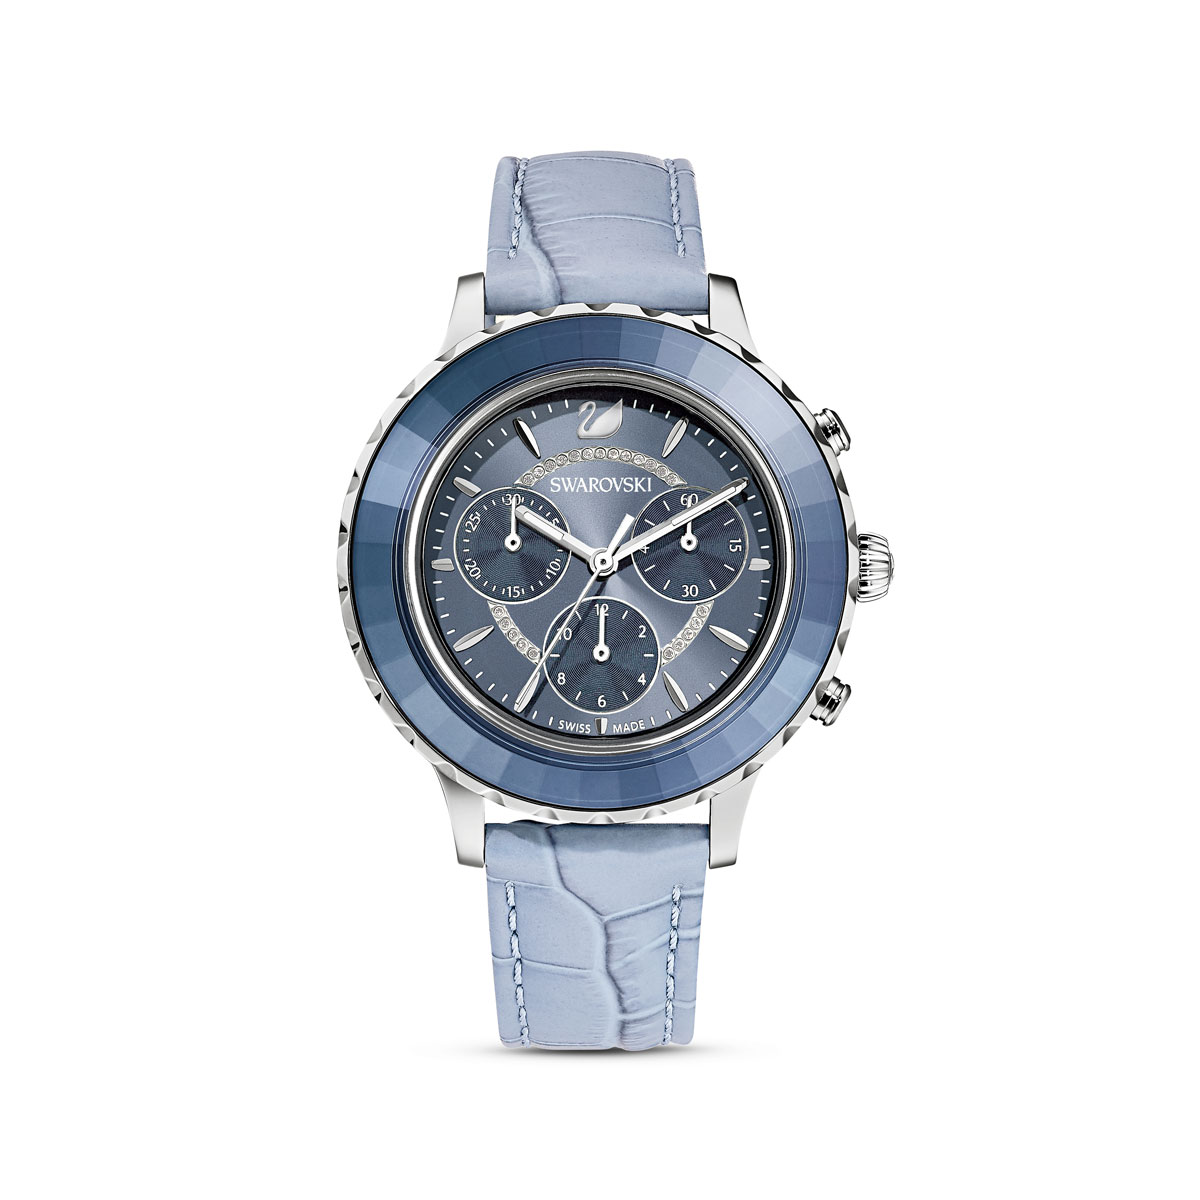 Swarovski Watch Octea Lux Chrono Stainless Case Denim Blue Dial, Denim Blue Leather Strap